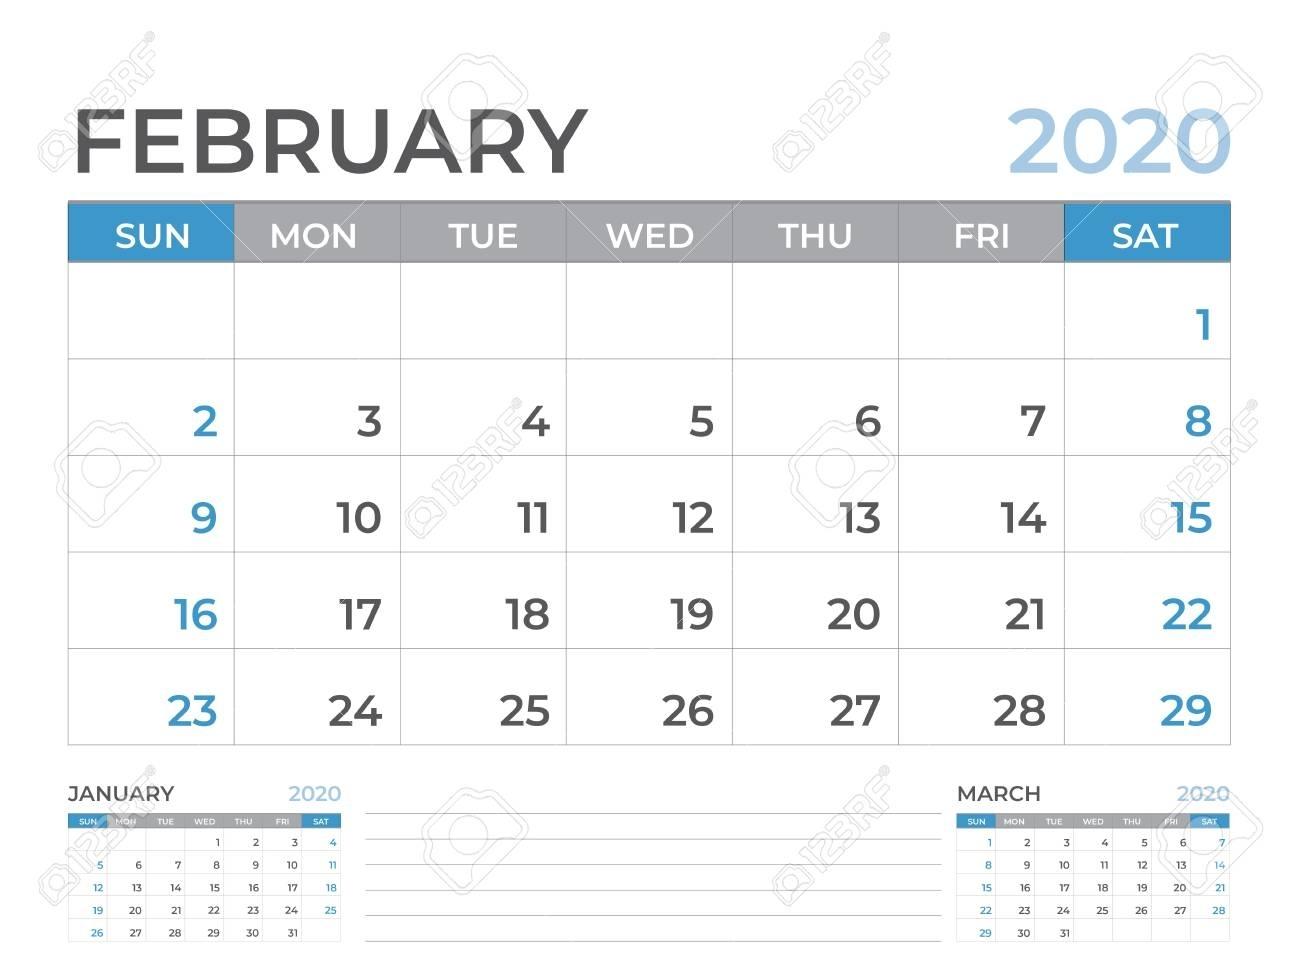 February 2020 Calendar Template, Desk Calendar Layout Size 8..